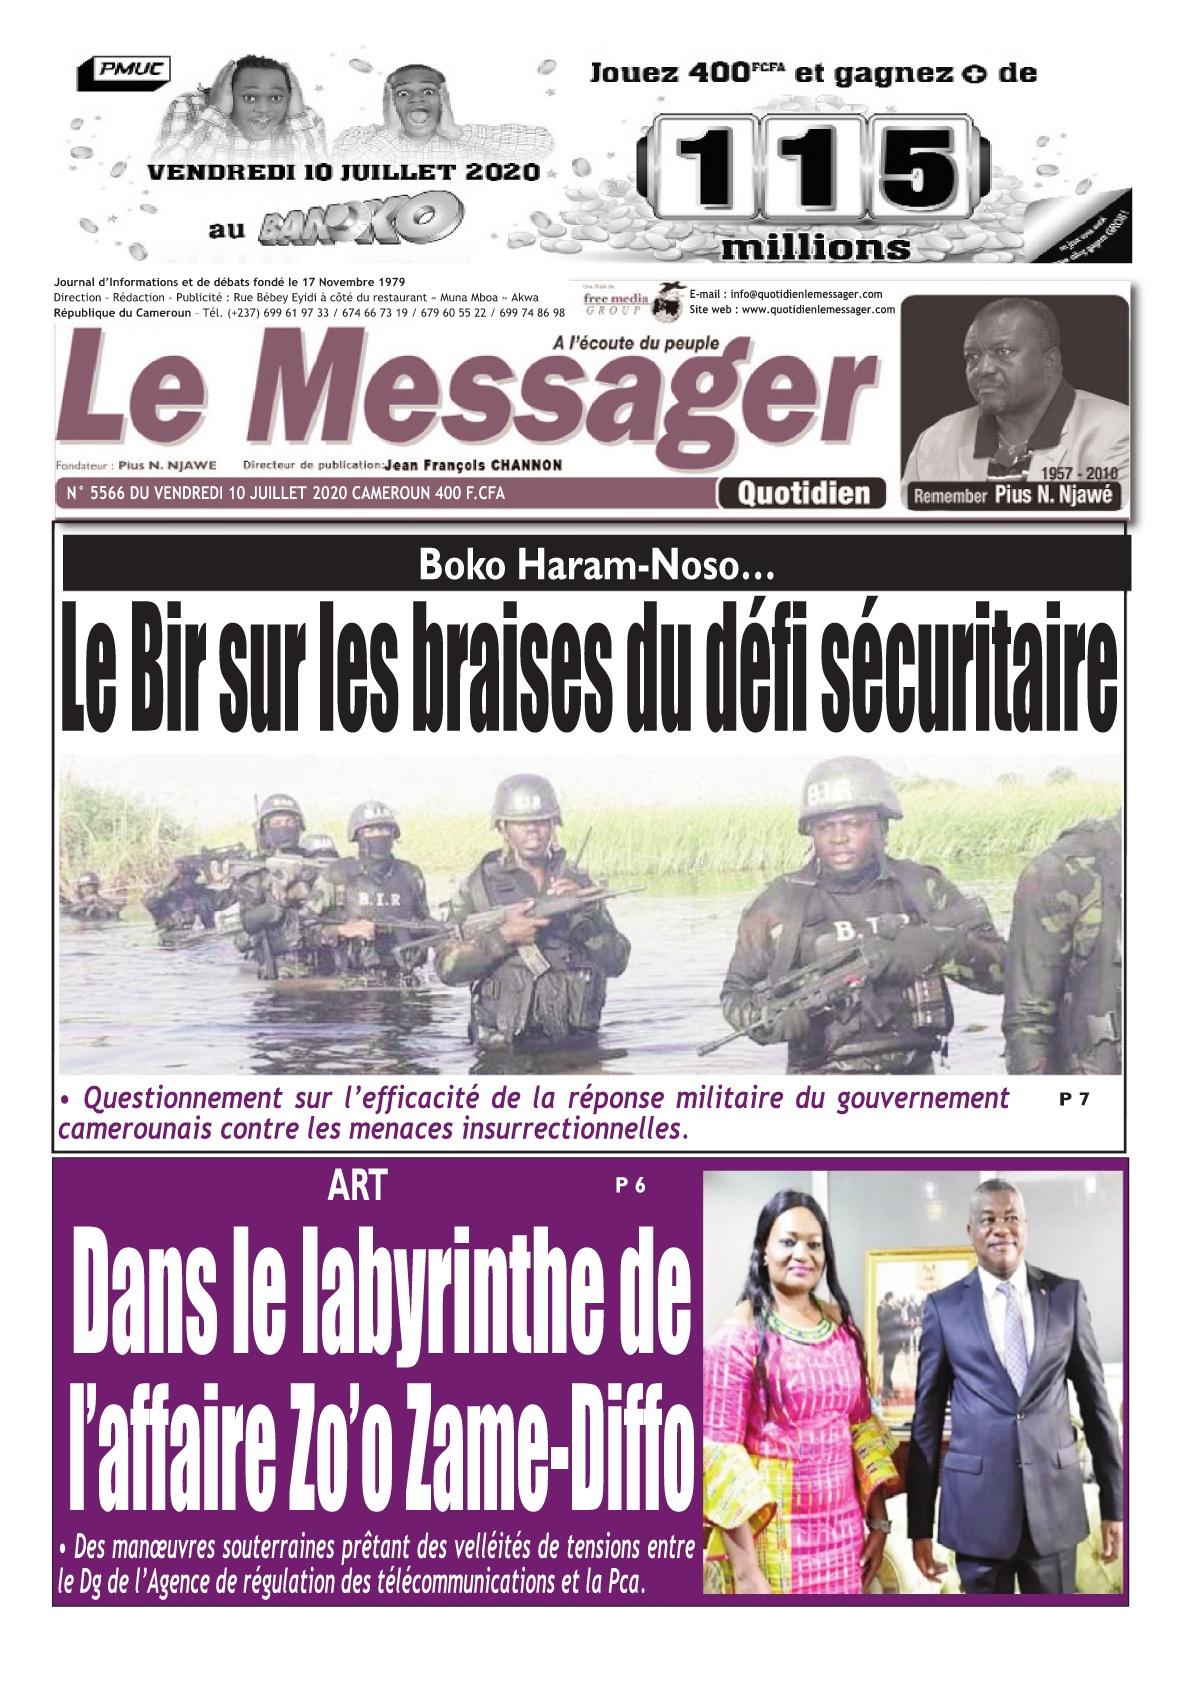 Le Messager - 10/07/2020